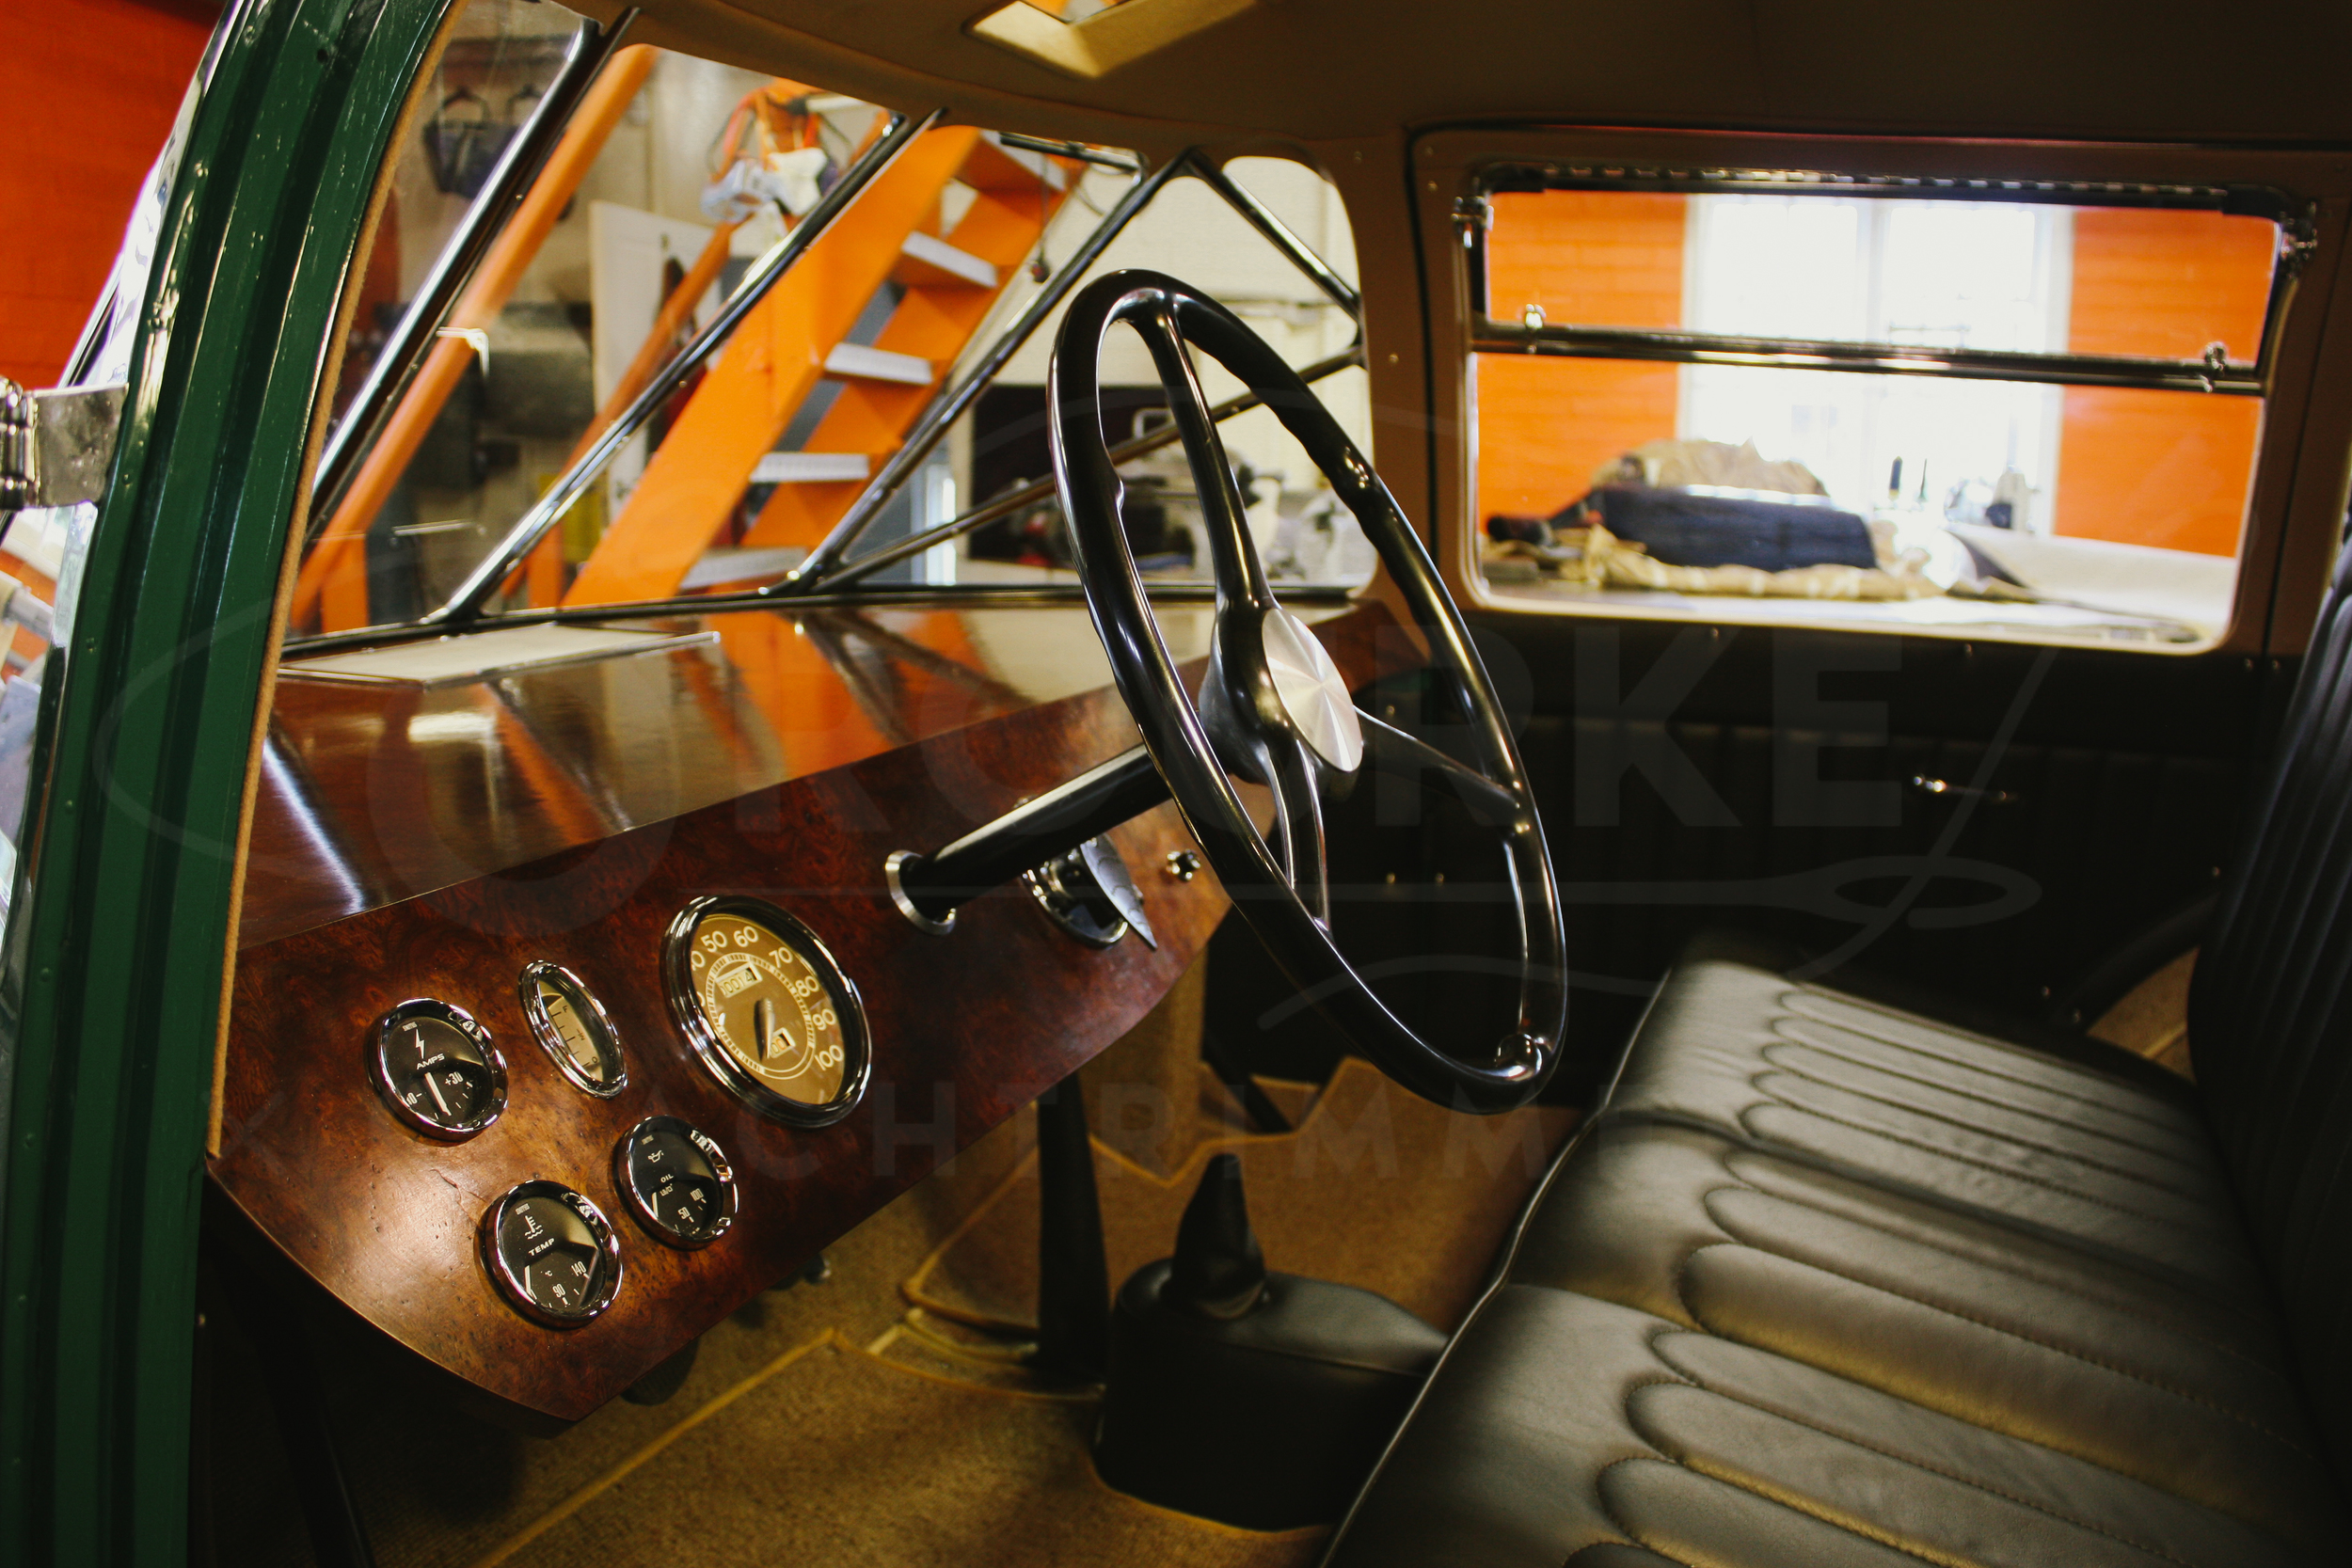 o-rourke-coachtrimmers-dymaxion-car-3-1.jpg